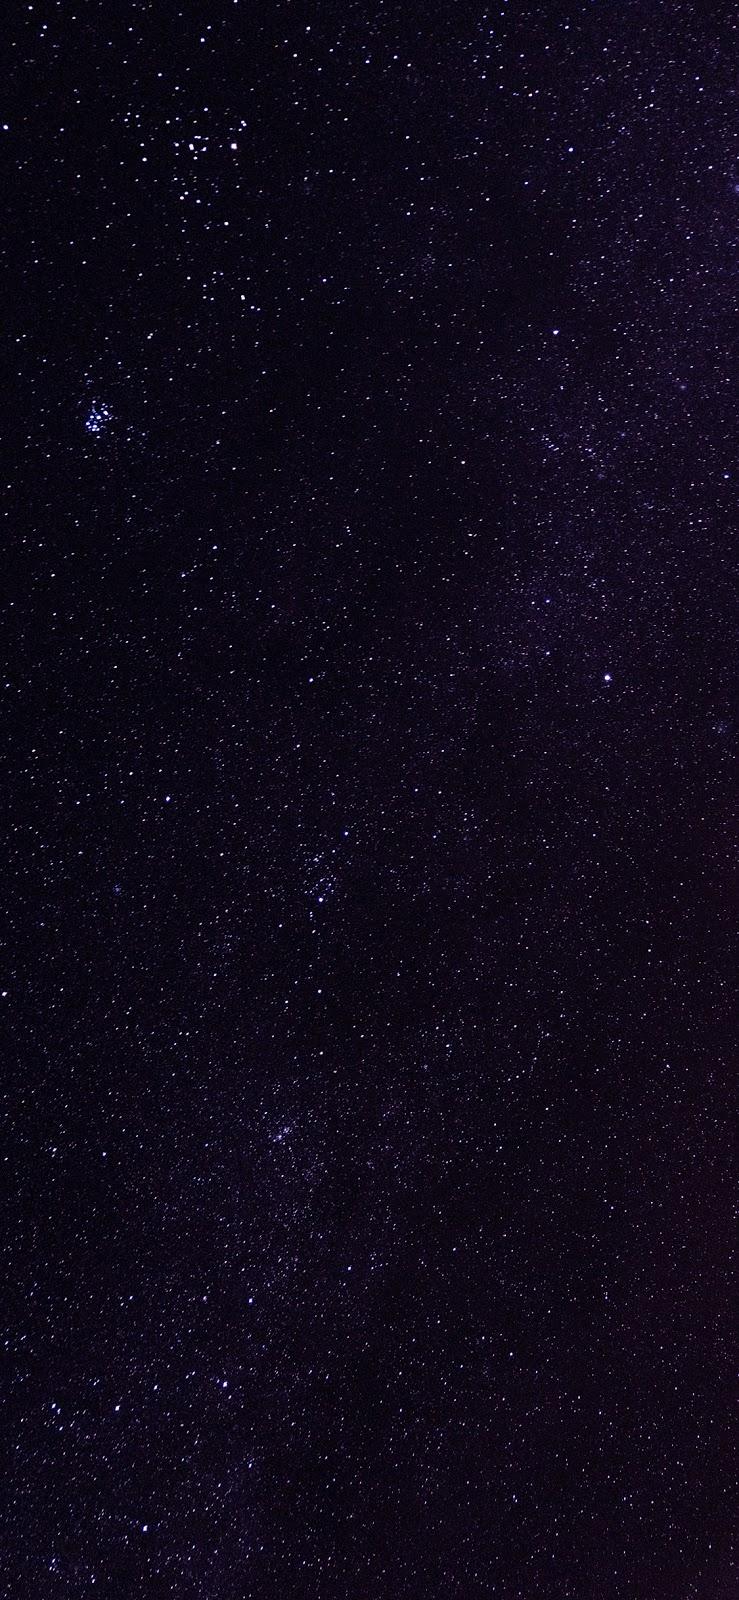 Milky Way Wallpaper Iphone X Universe Wallpaper Iphone 11 3075907 Hd Wallpaper Backgrounds Download